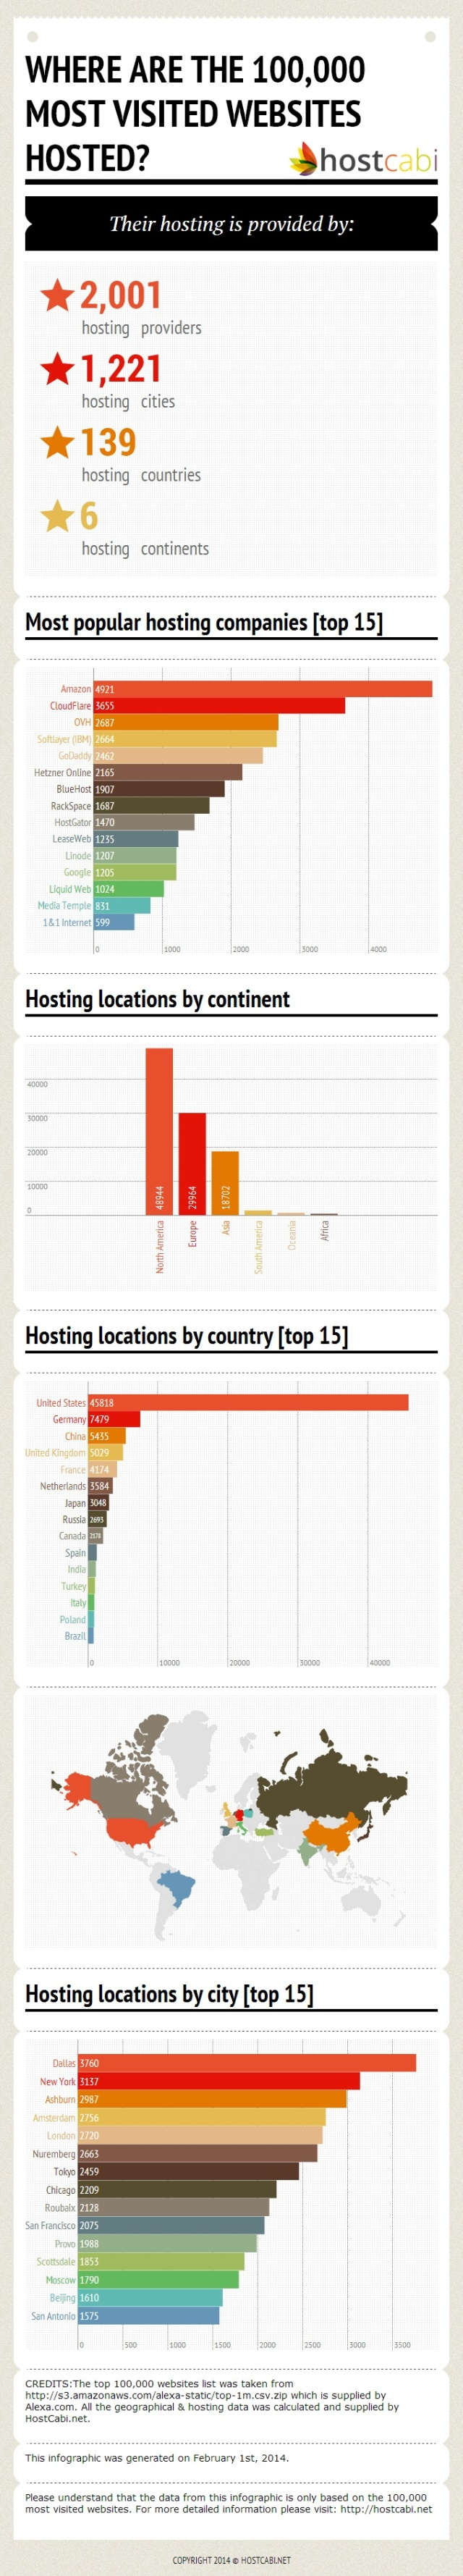 hosting-location